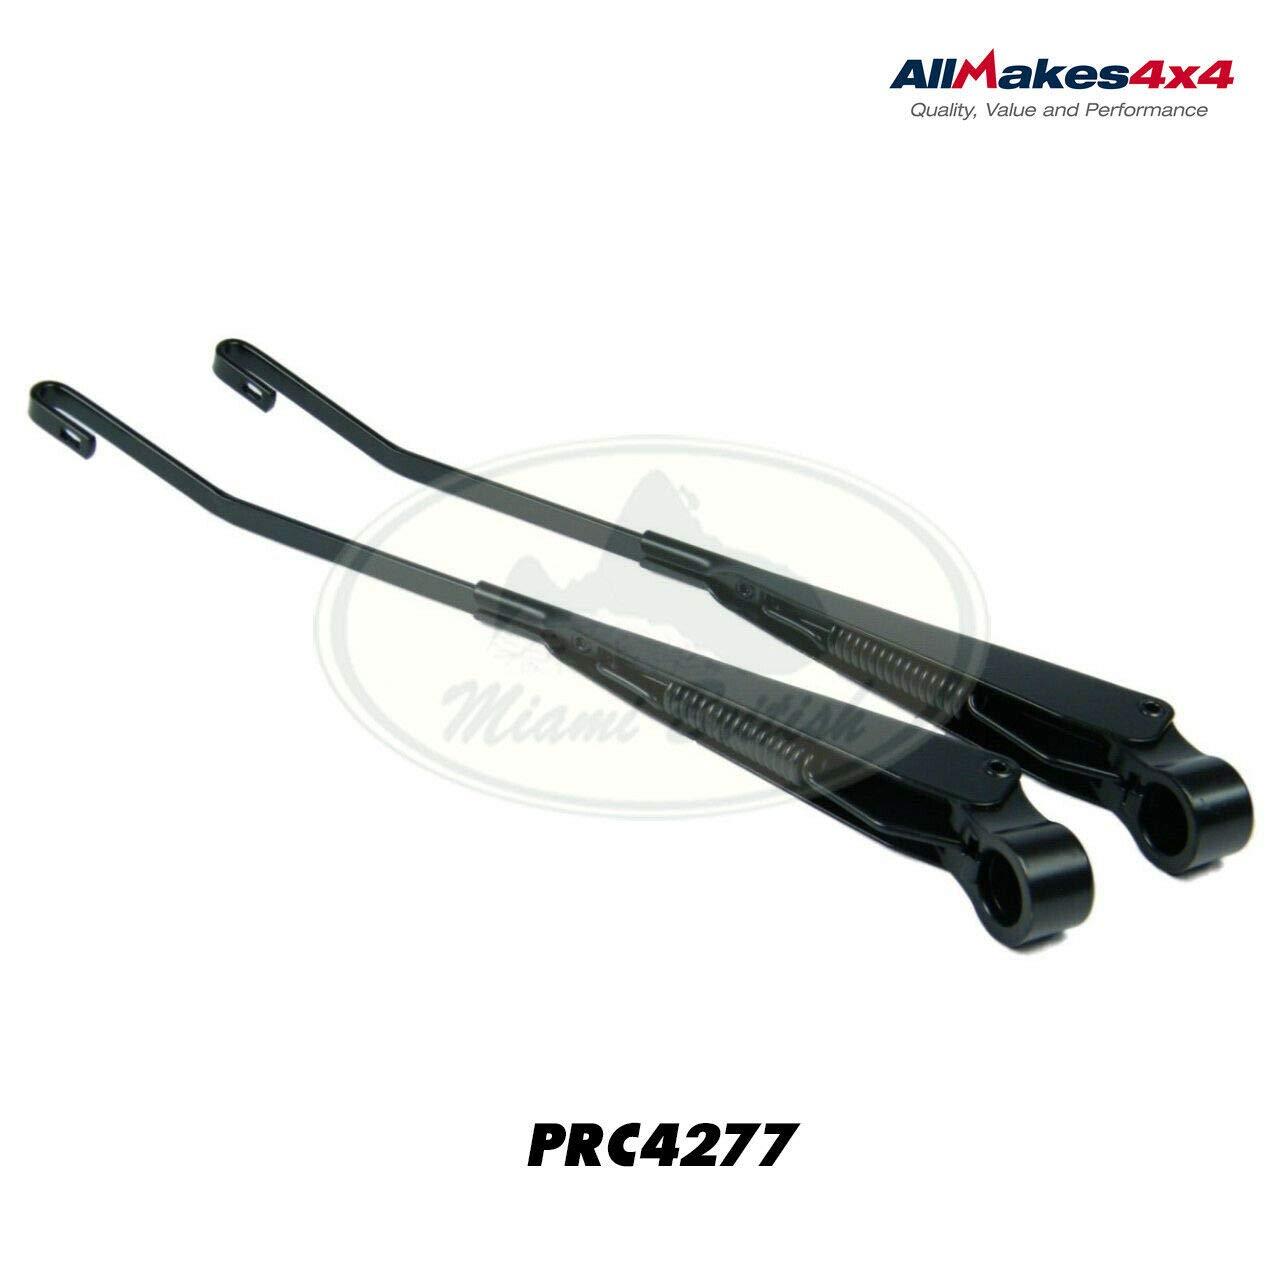 FRONT WIPER ARM X2 DEFENDER 87-01 PRC4277 ALLMAKES4X4